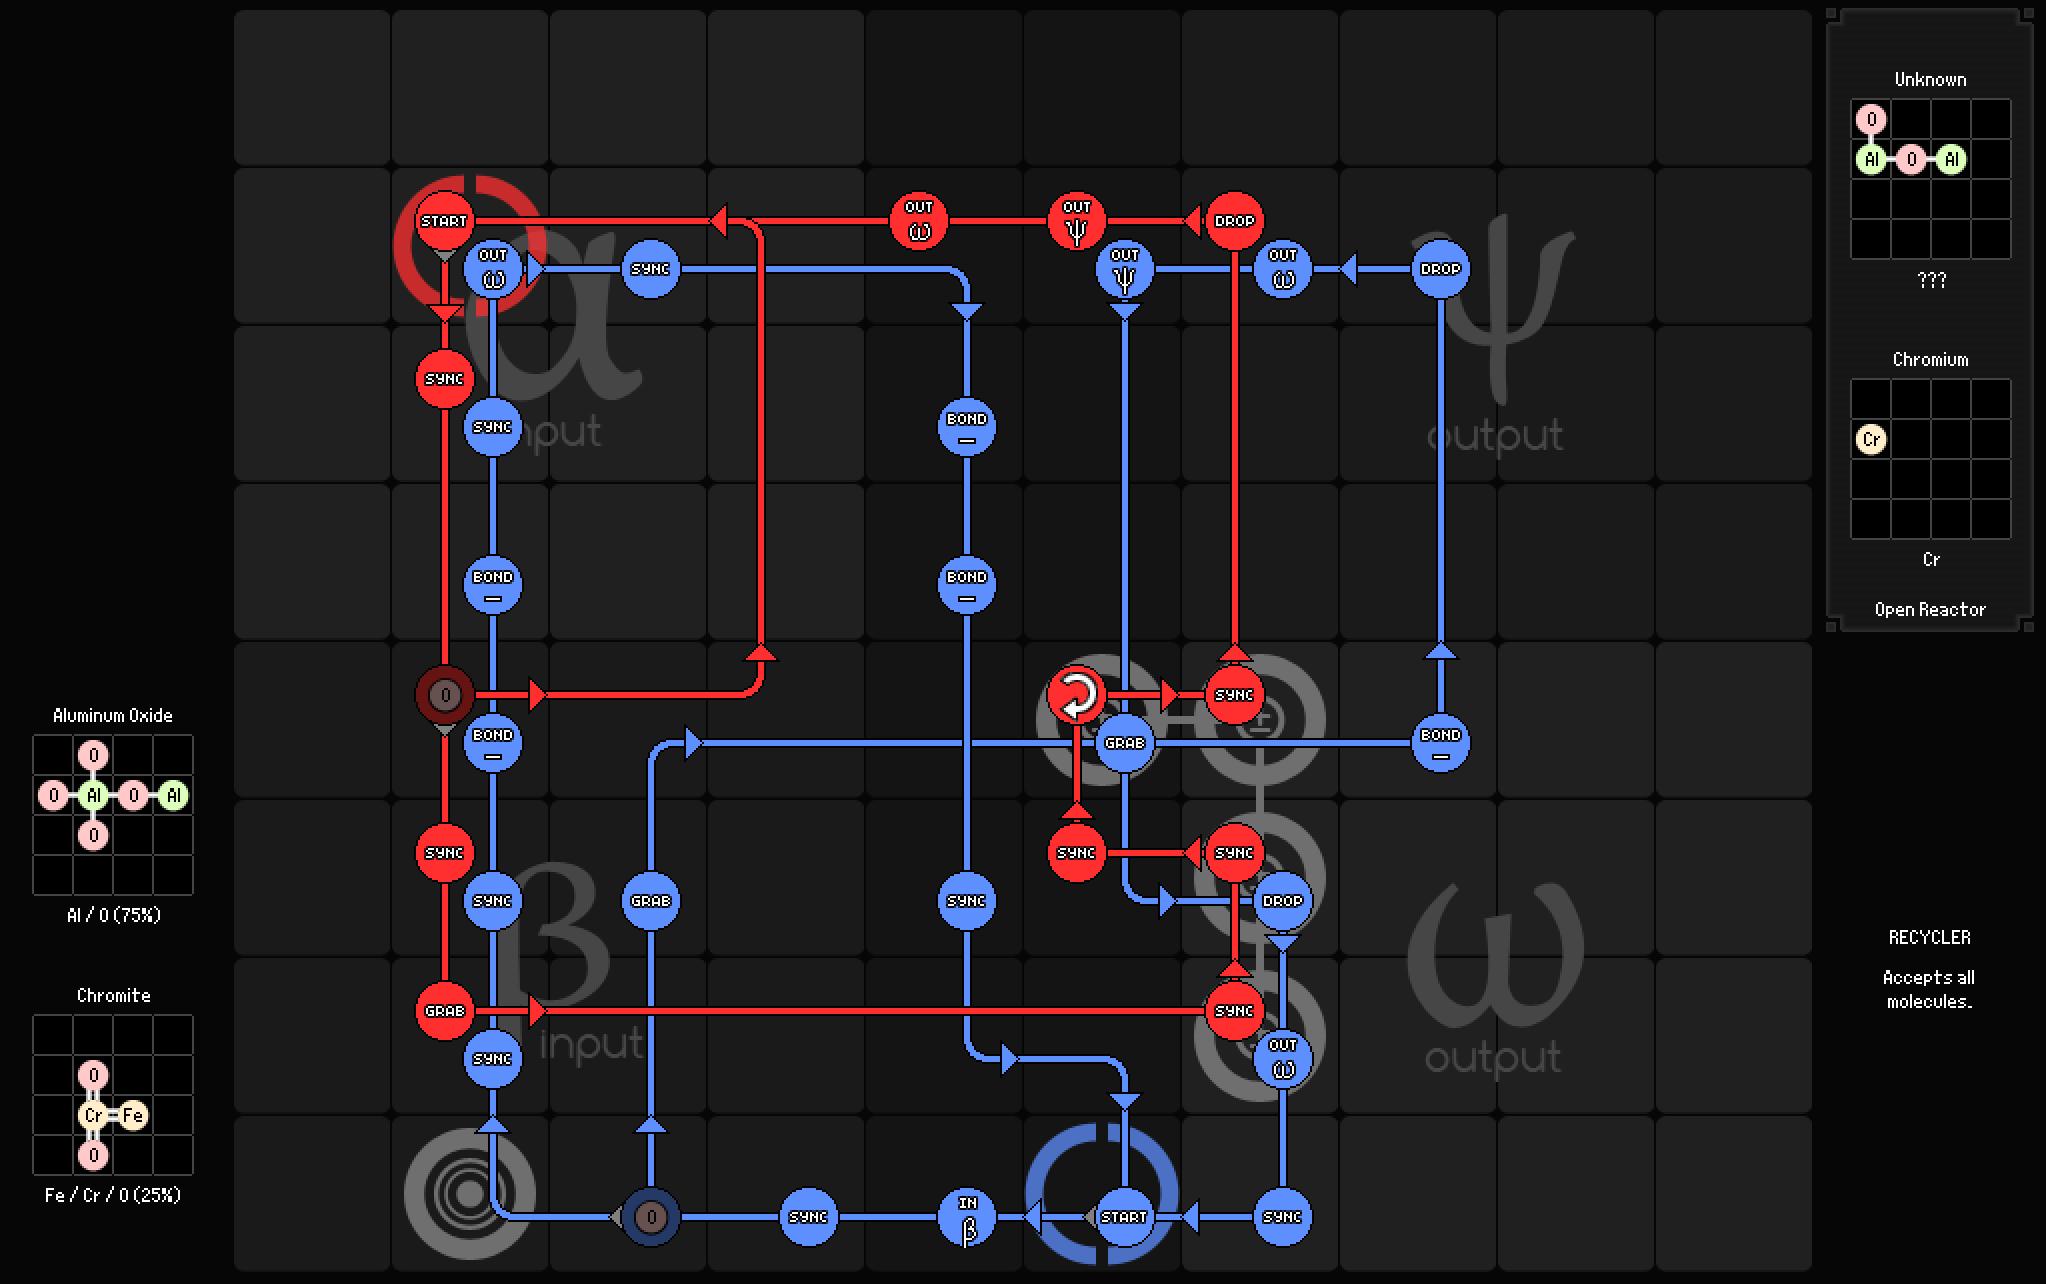 1_Story_Mode/6_Hephaestus_IV/SpaceChem-6.8.a-boss/Reactor_1.png